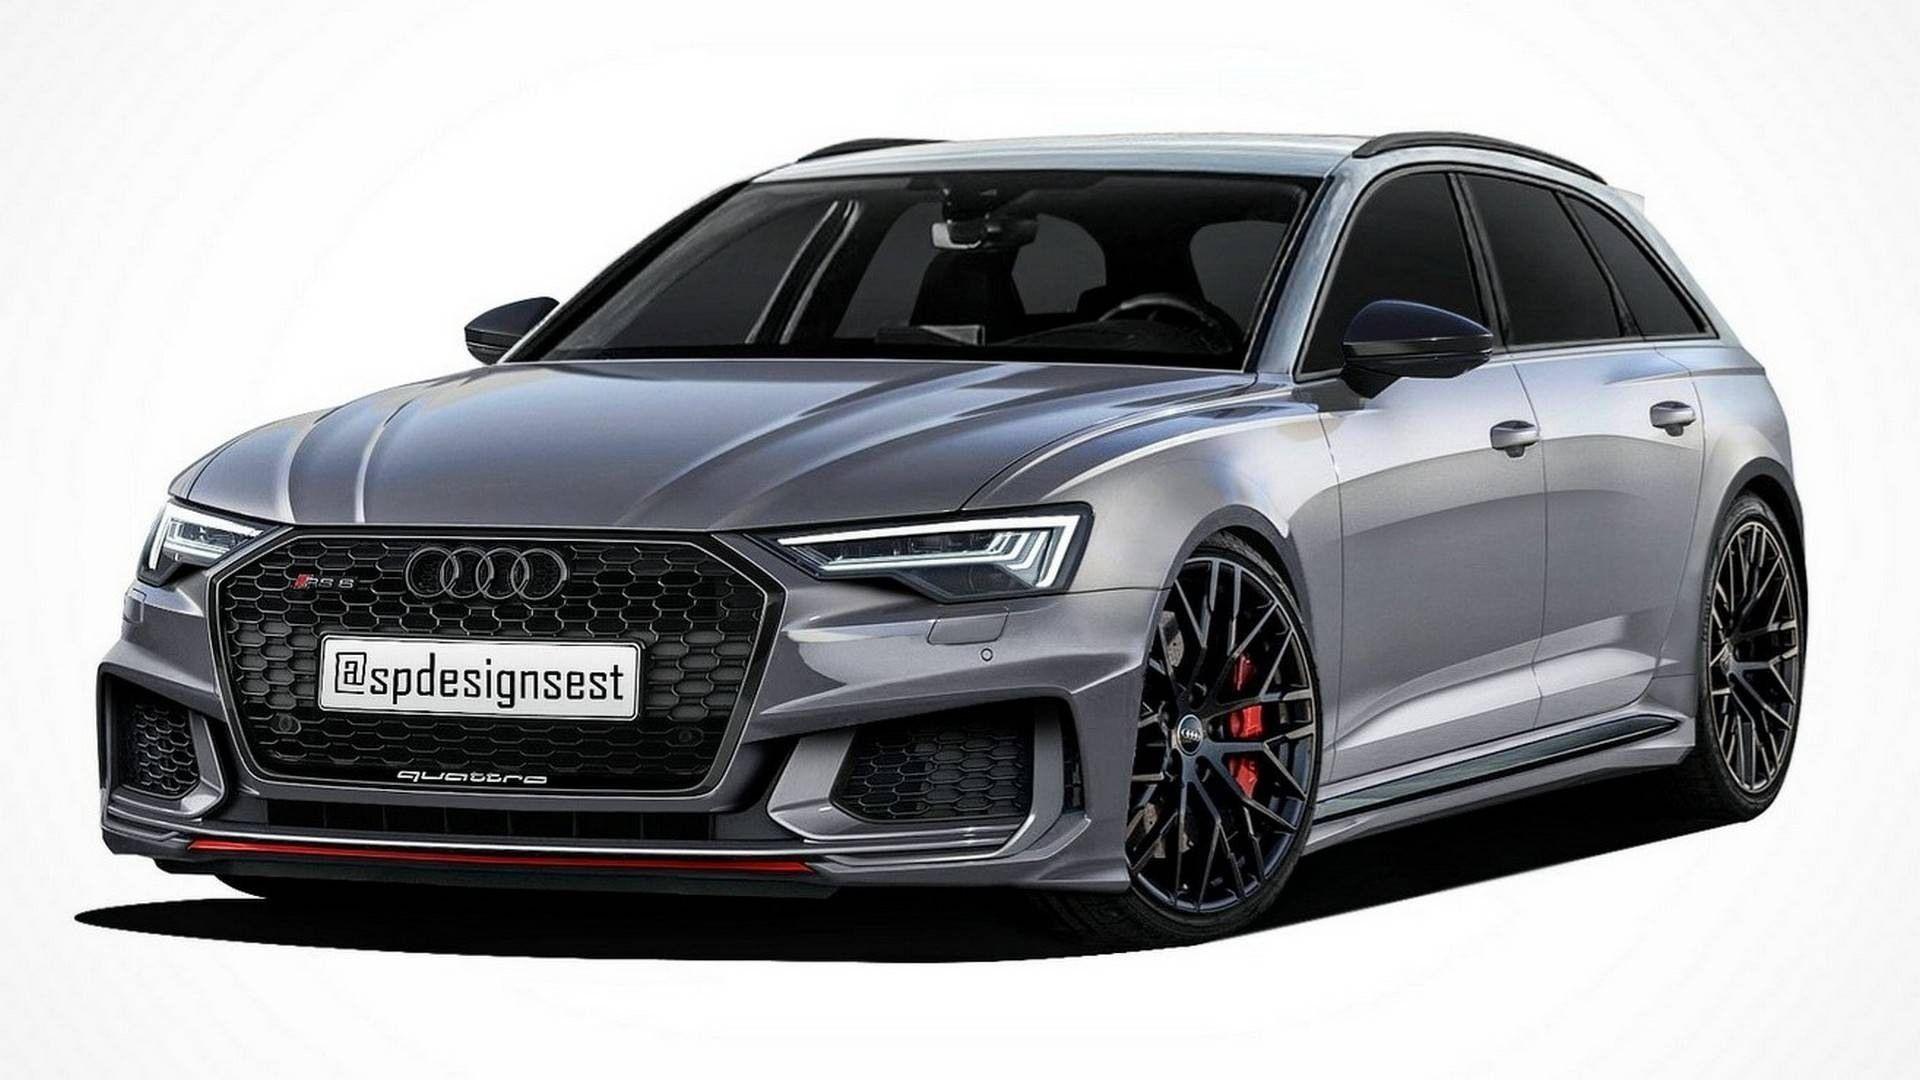 Audi 2019 Rs6 Redesign Price And Review Auto Hintergrundbilder Peugeot Volvo